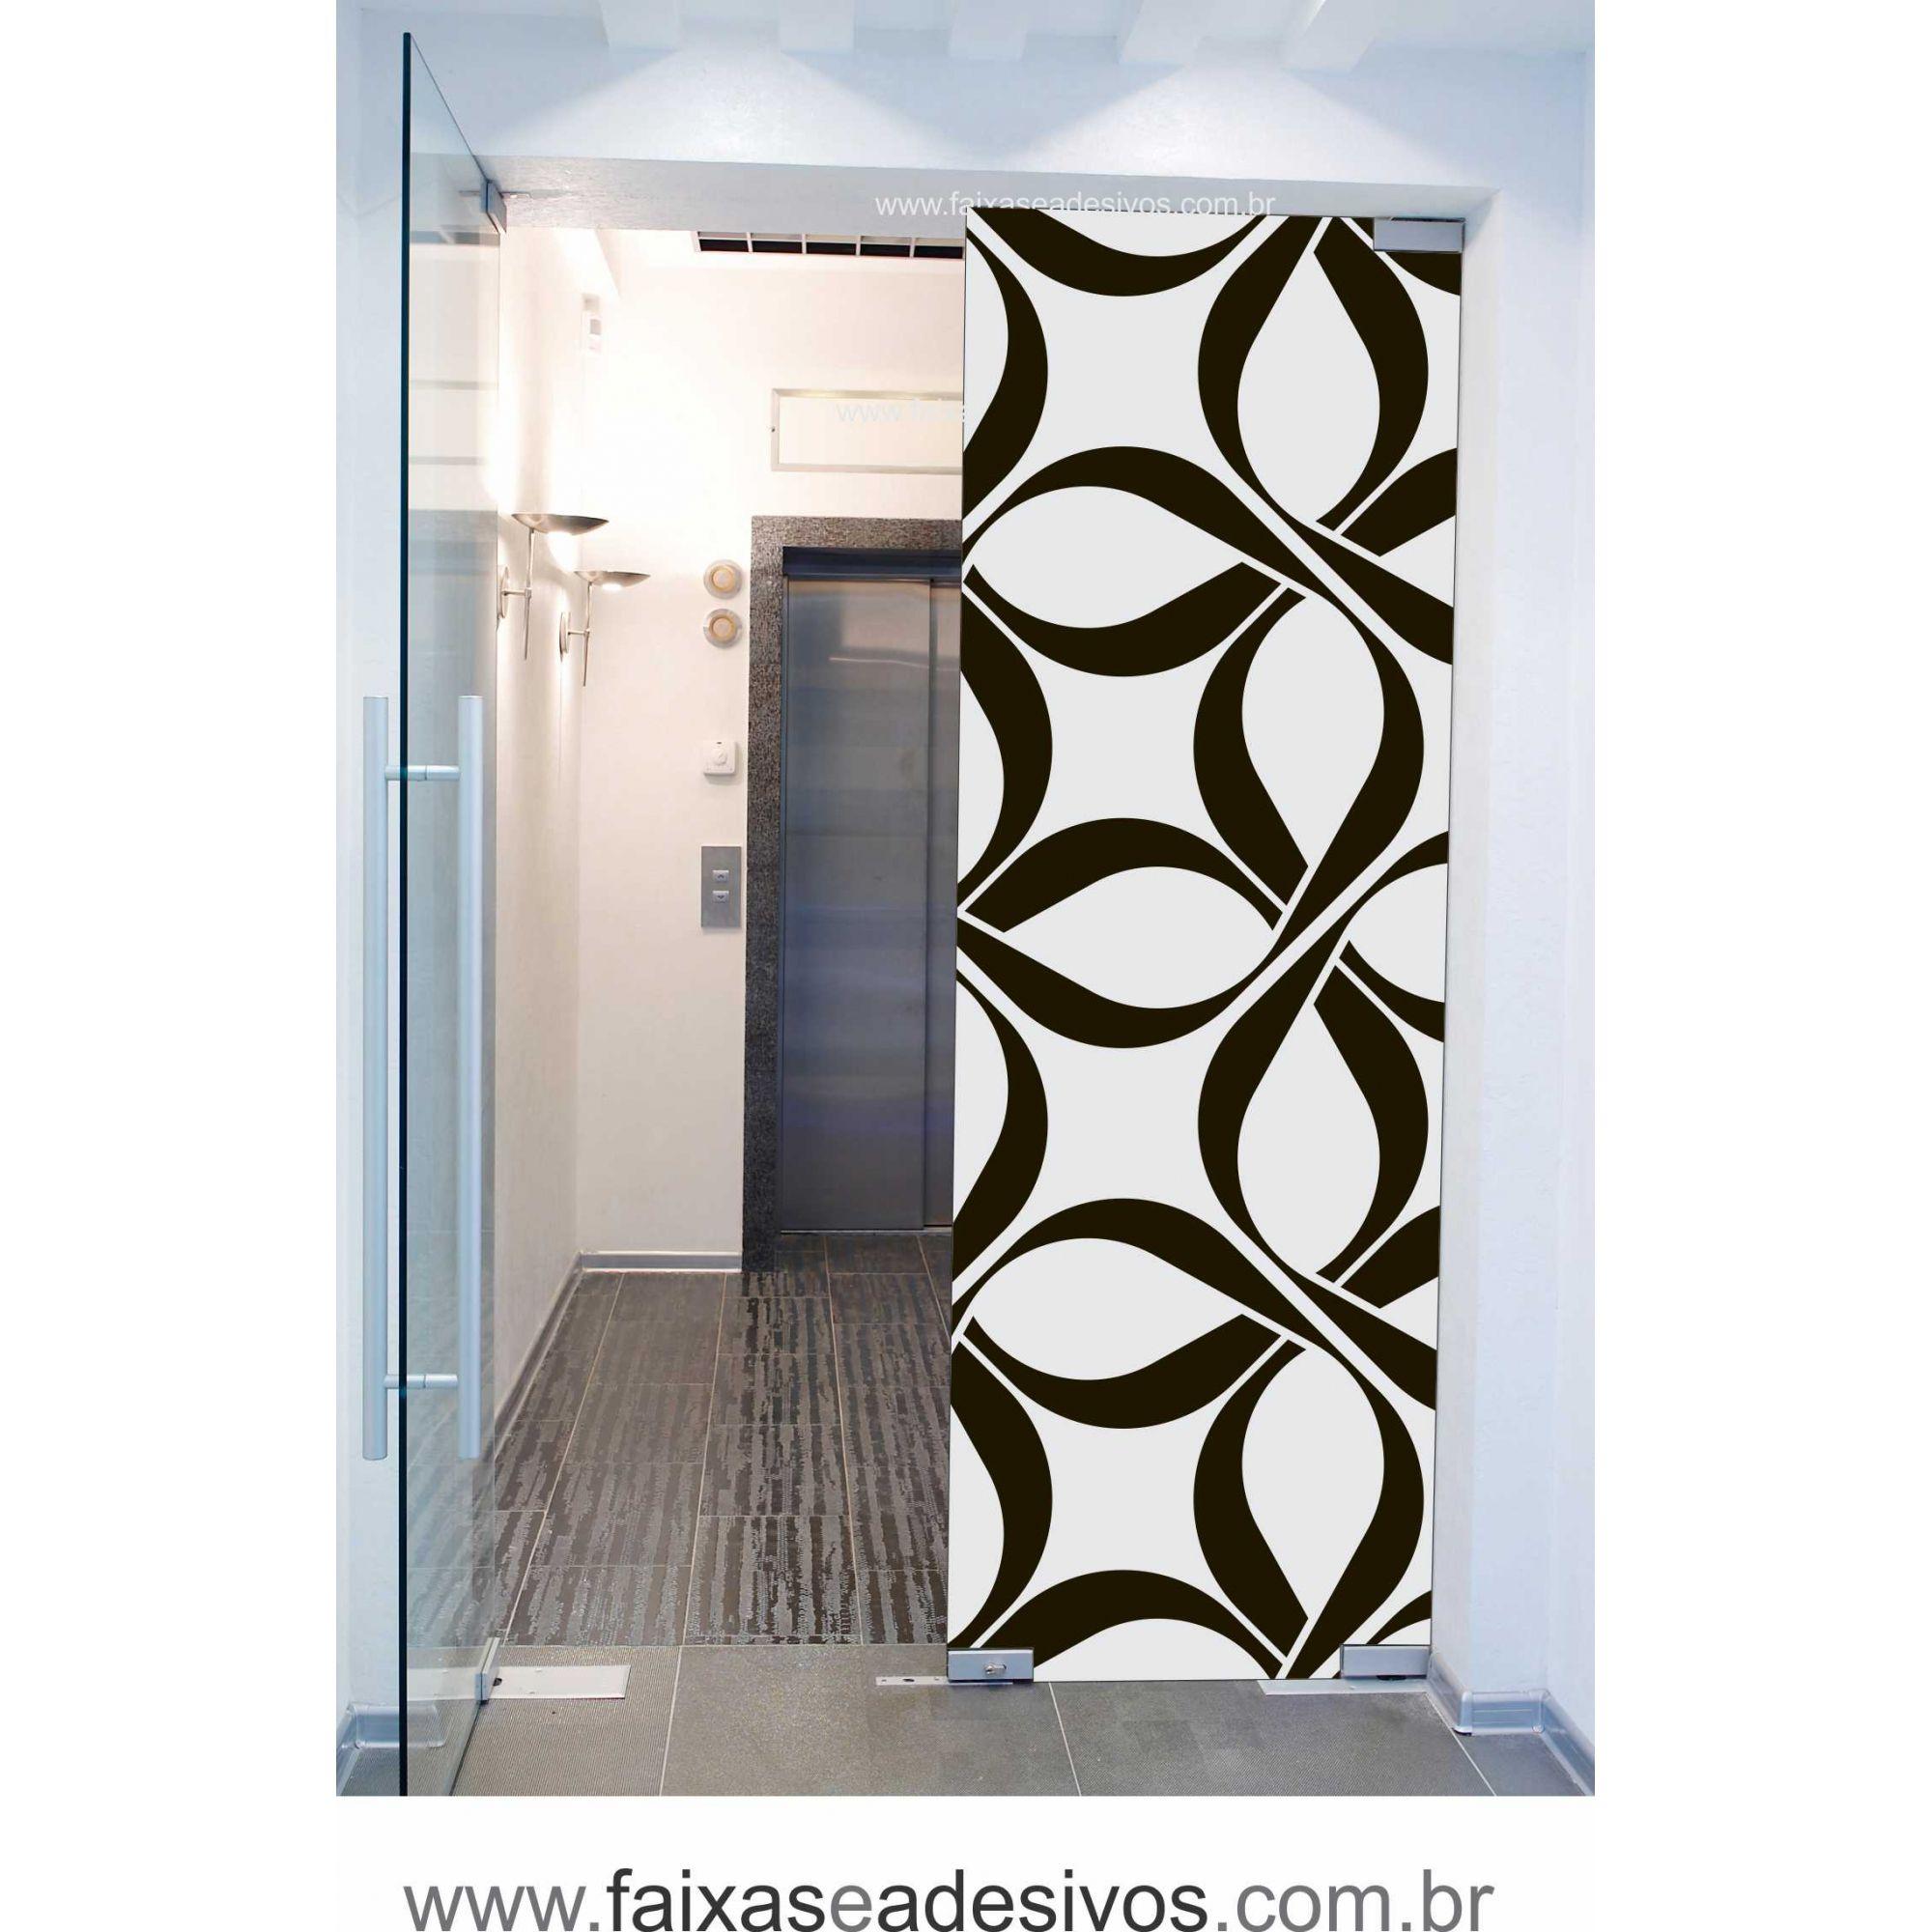 067 VD - Adesivo Jateado para vidro Ornamental grande 220x70cm  - Fac Signs